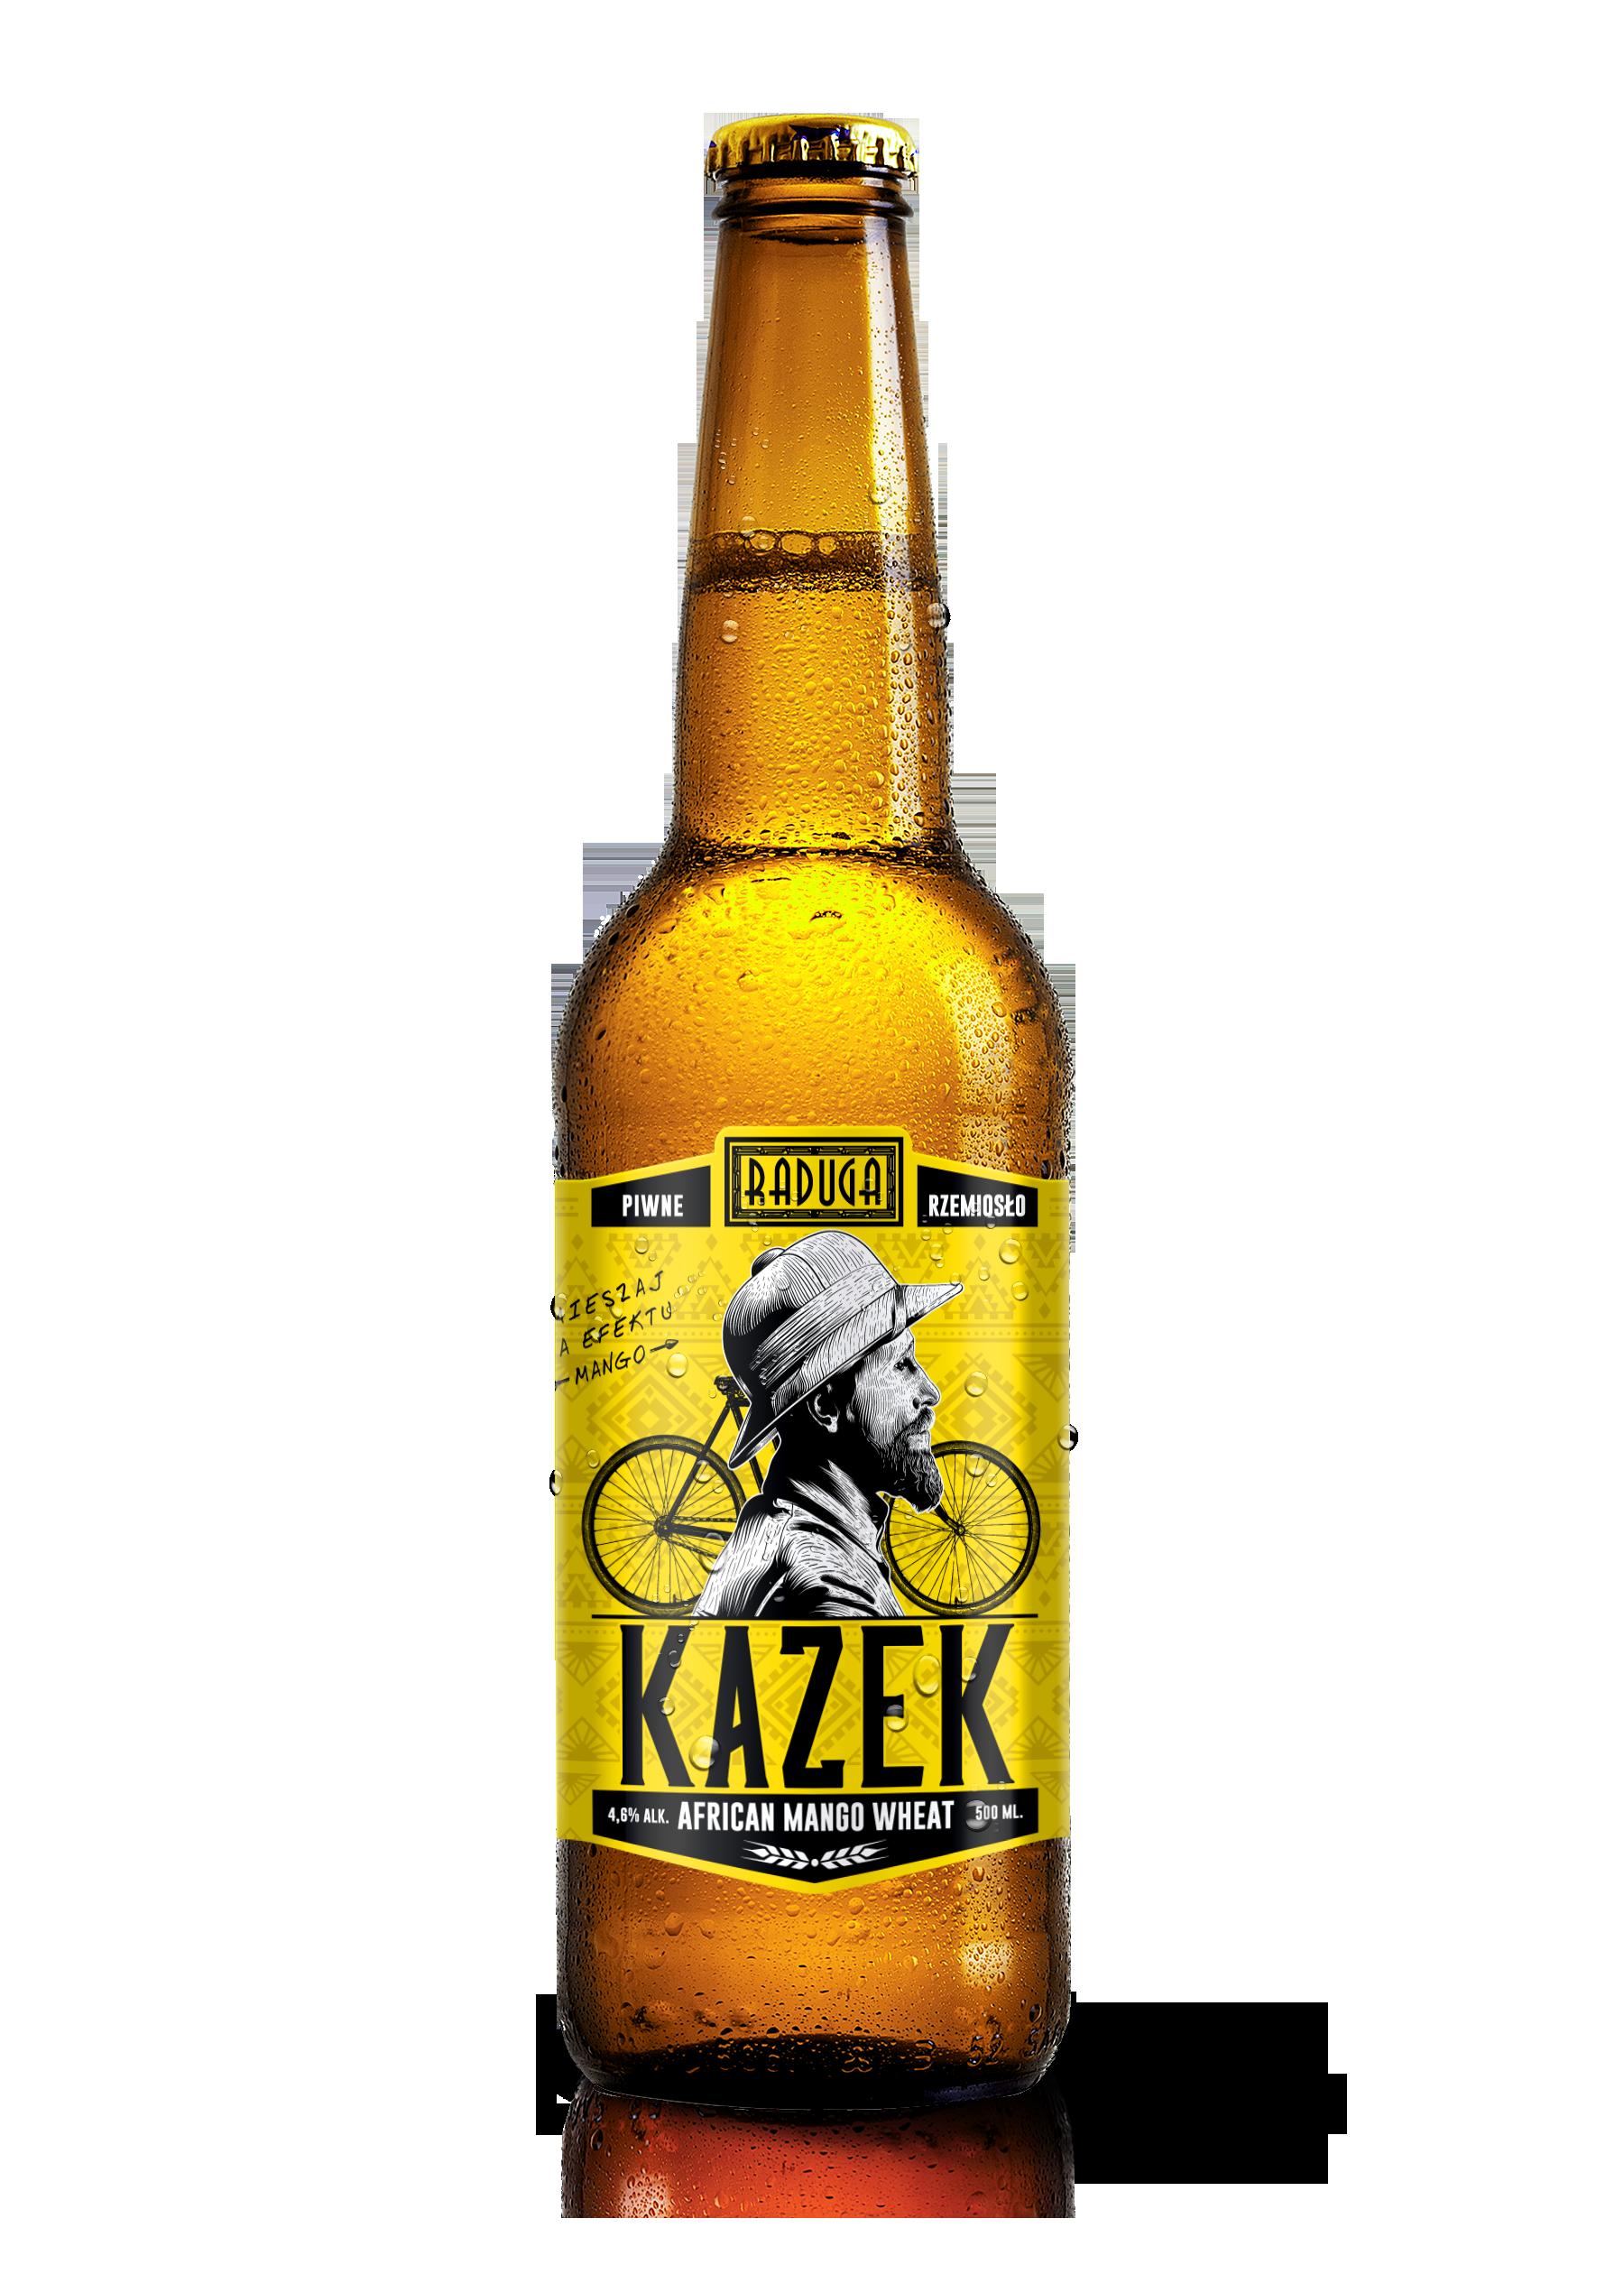 Kazek Wheat Beer